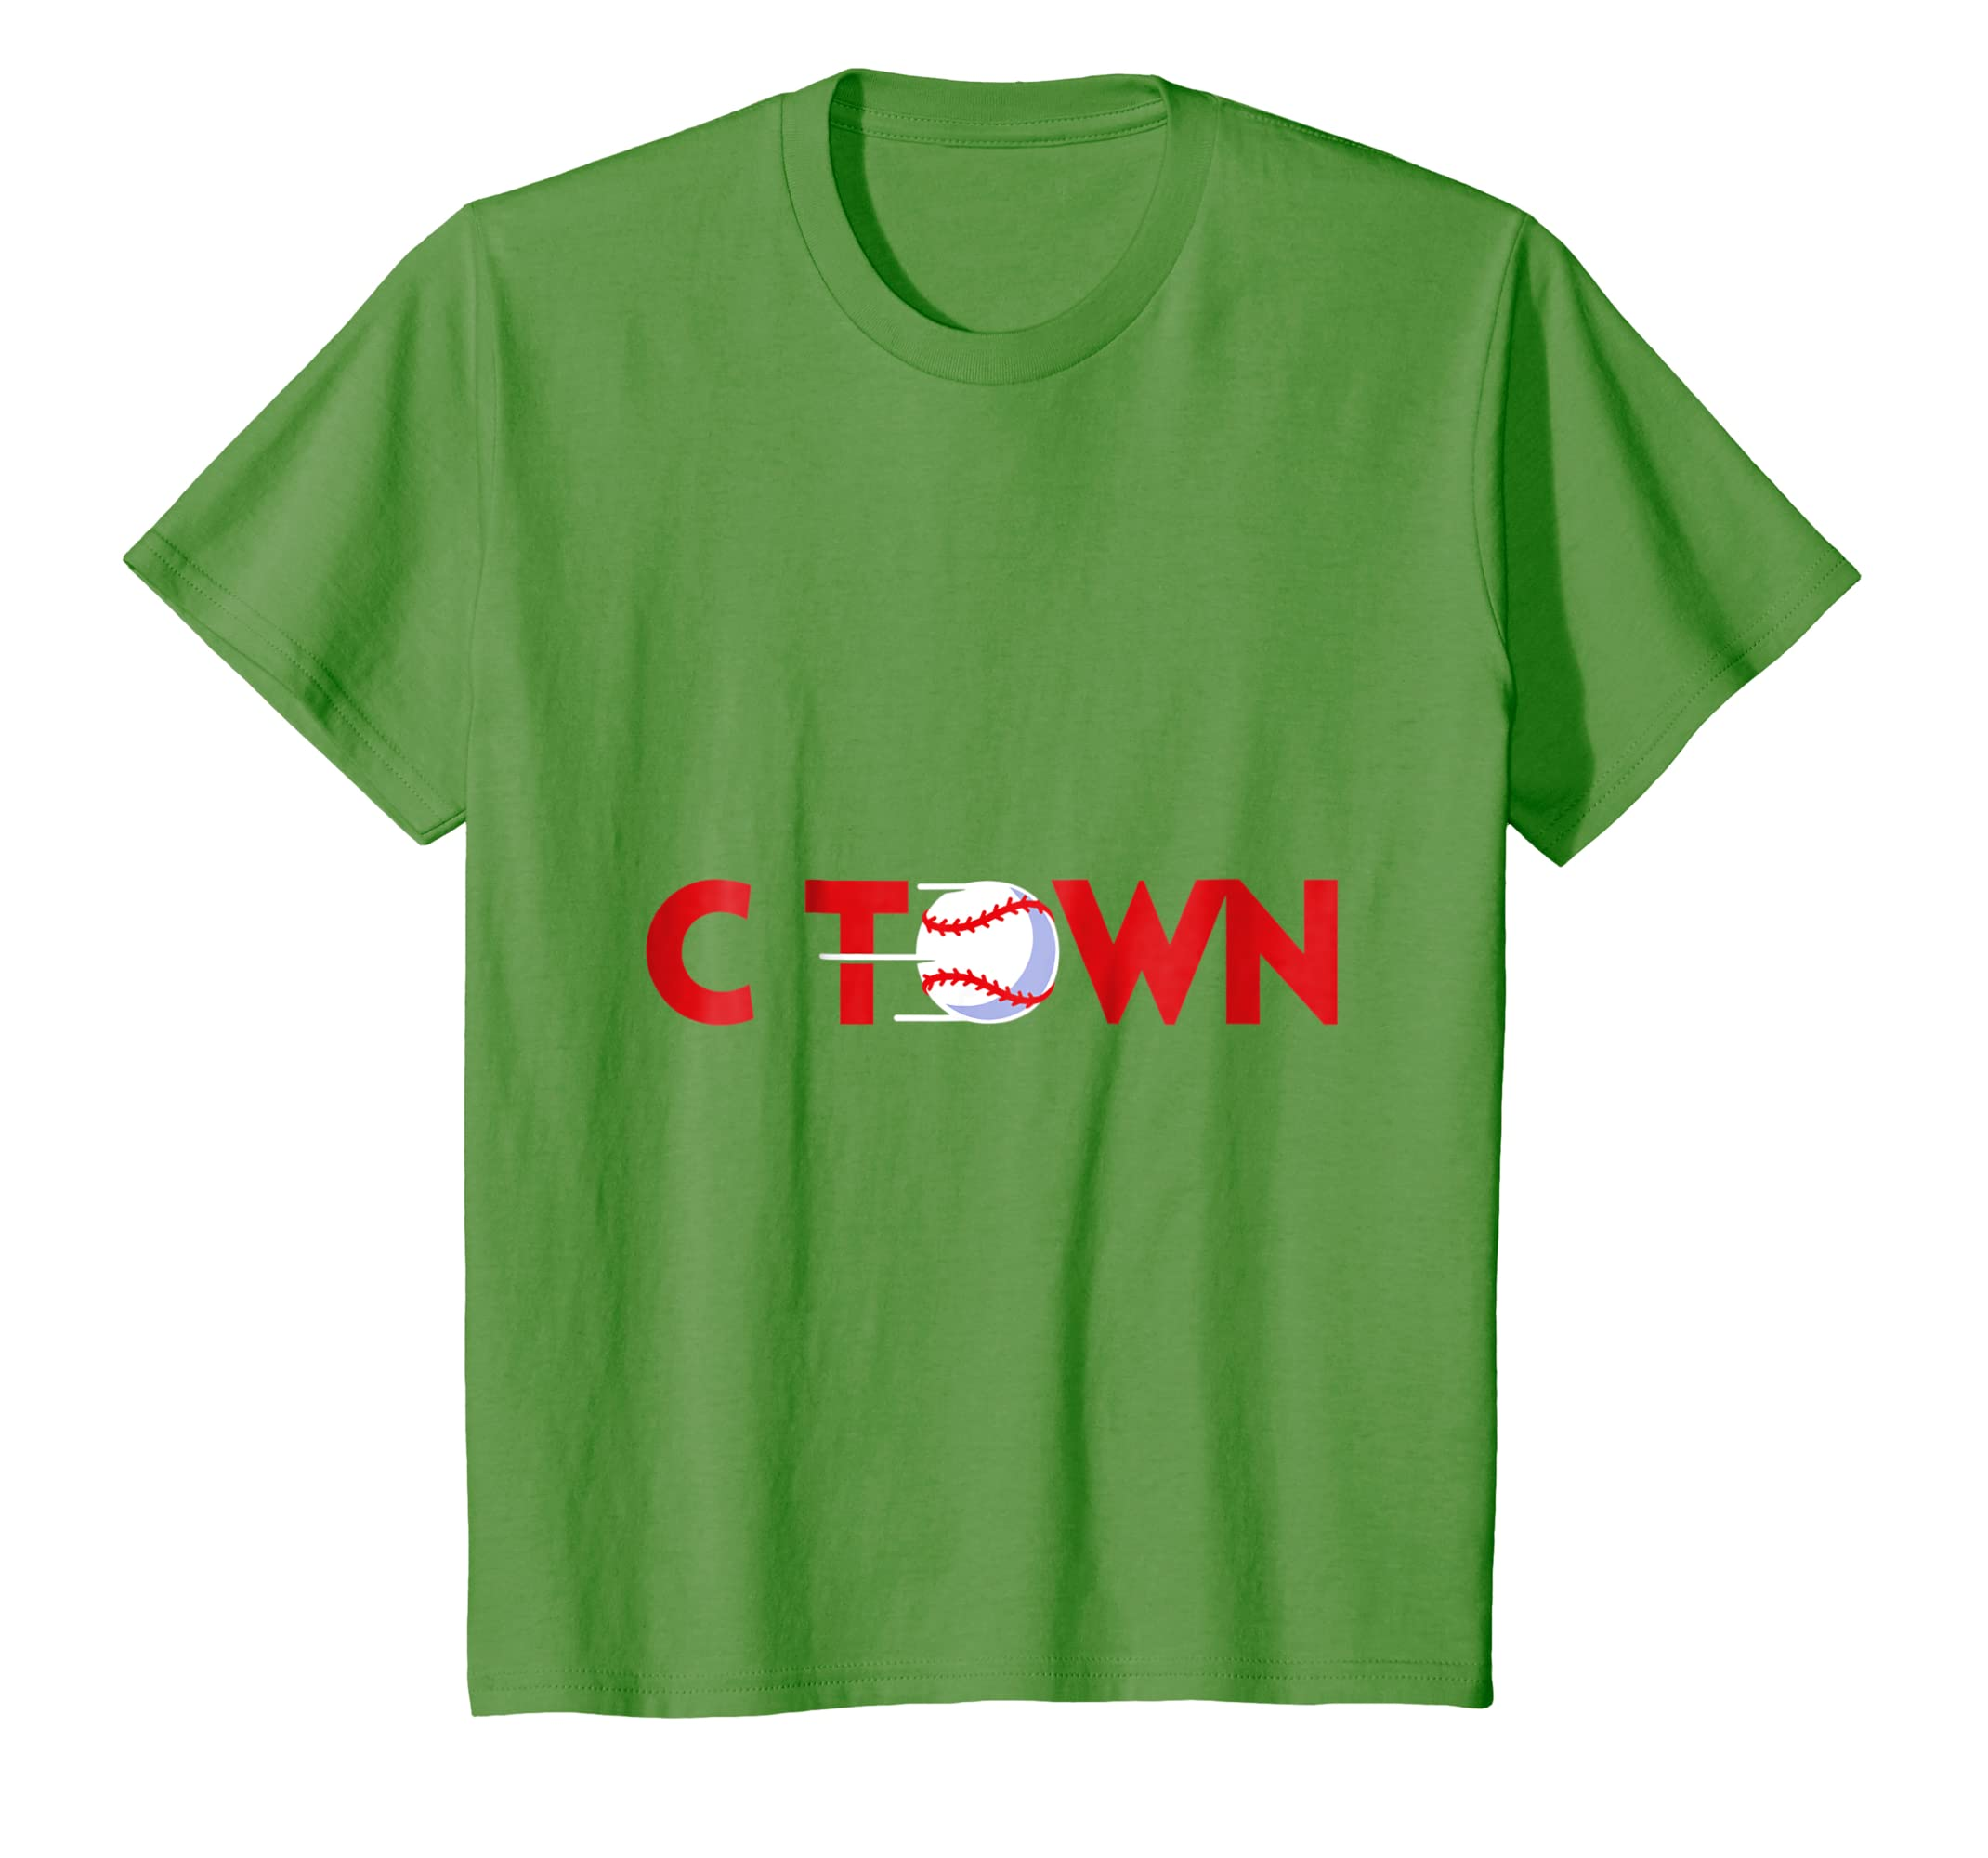 C Town Cleveland Shirts